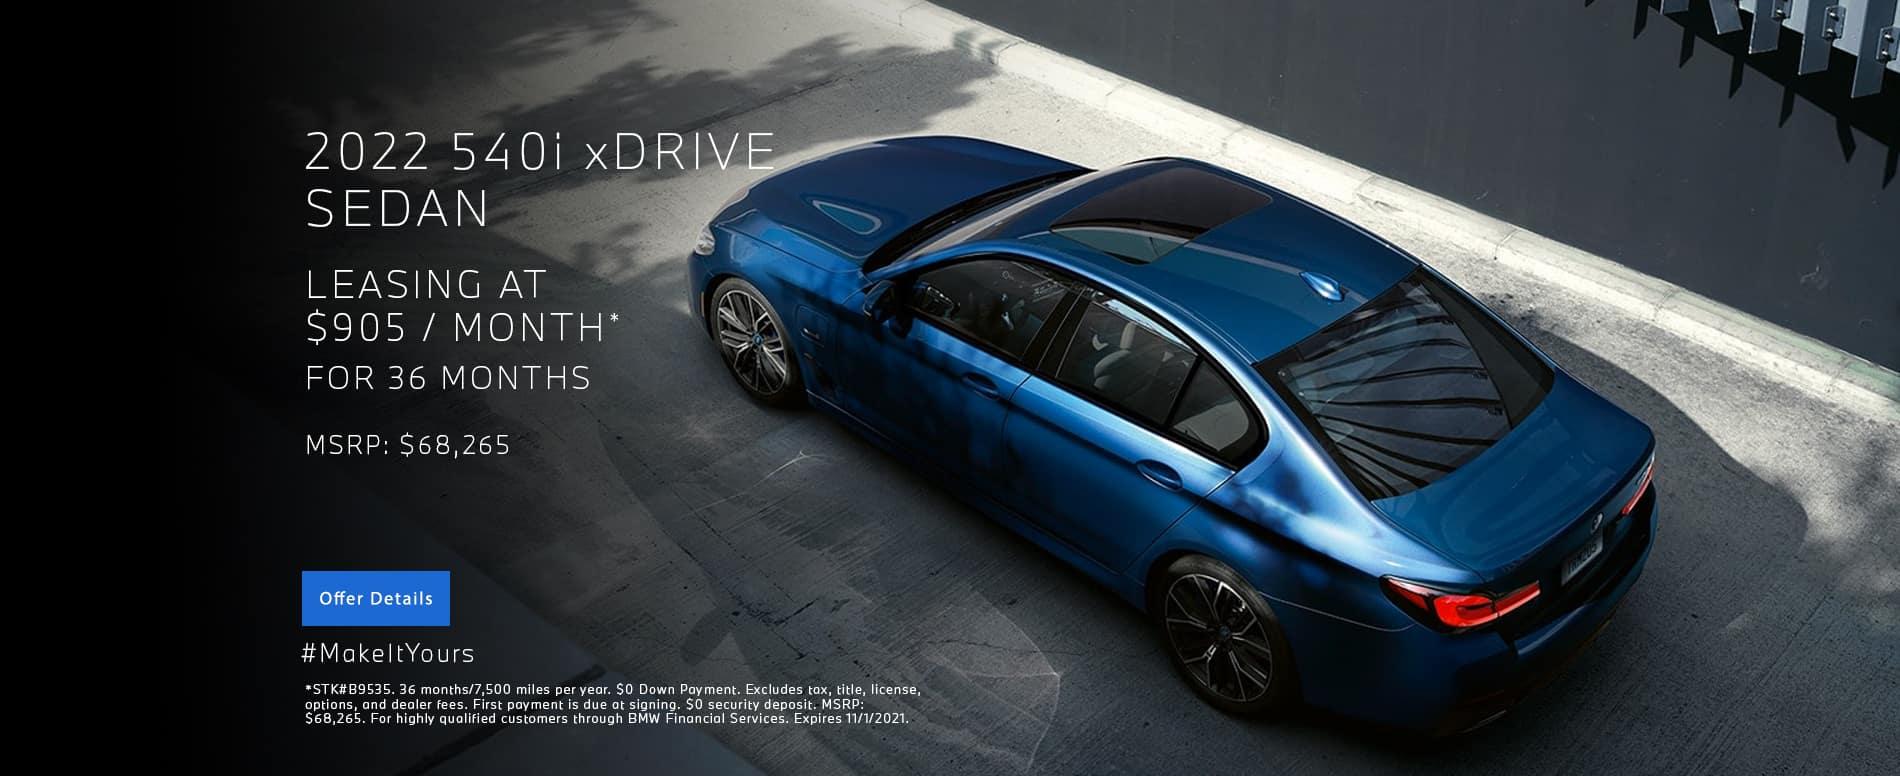 New 2022 540i xDrive Lease | BMW Minnetonka